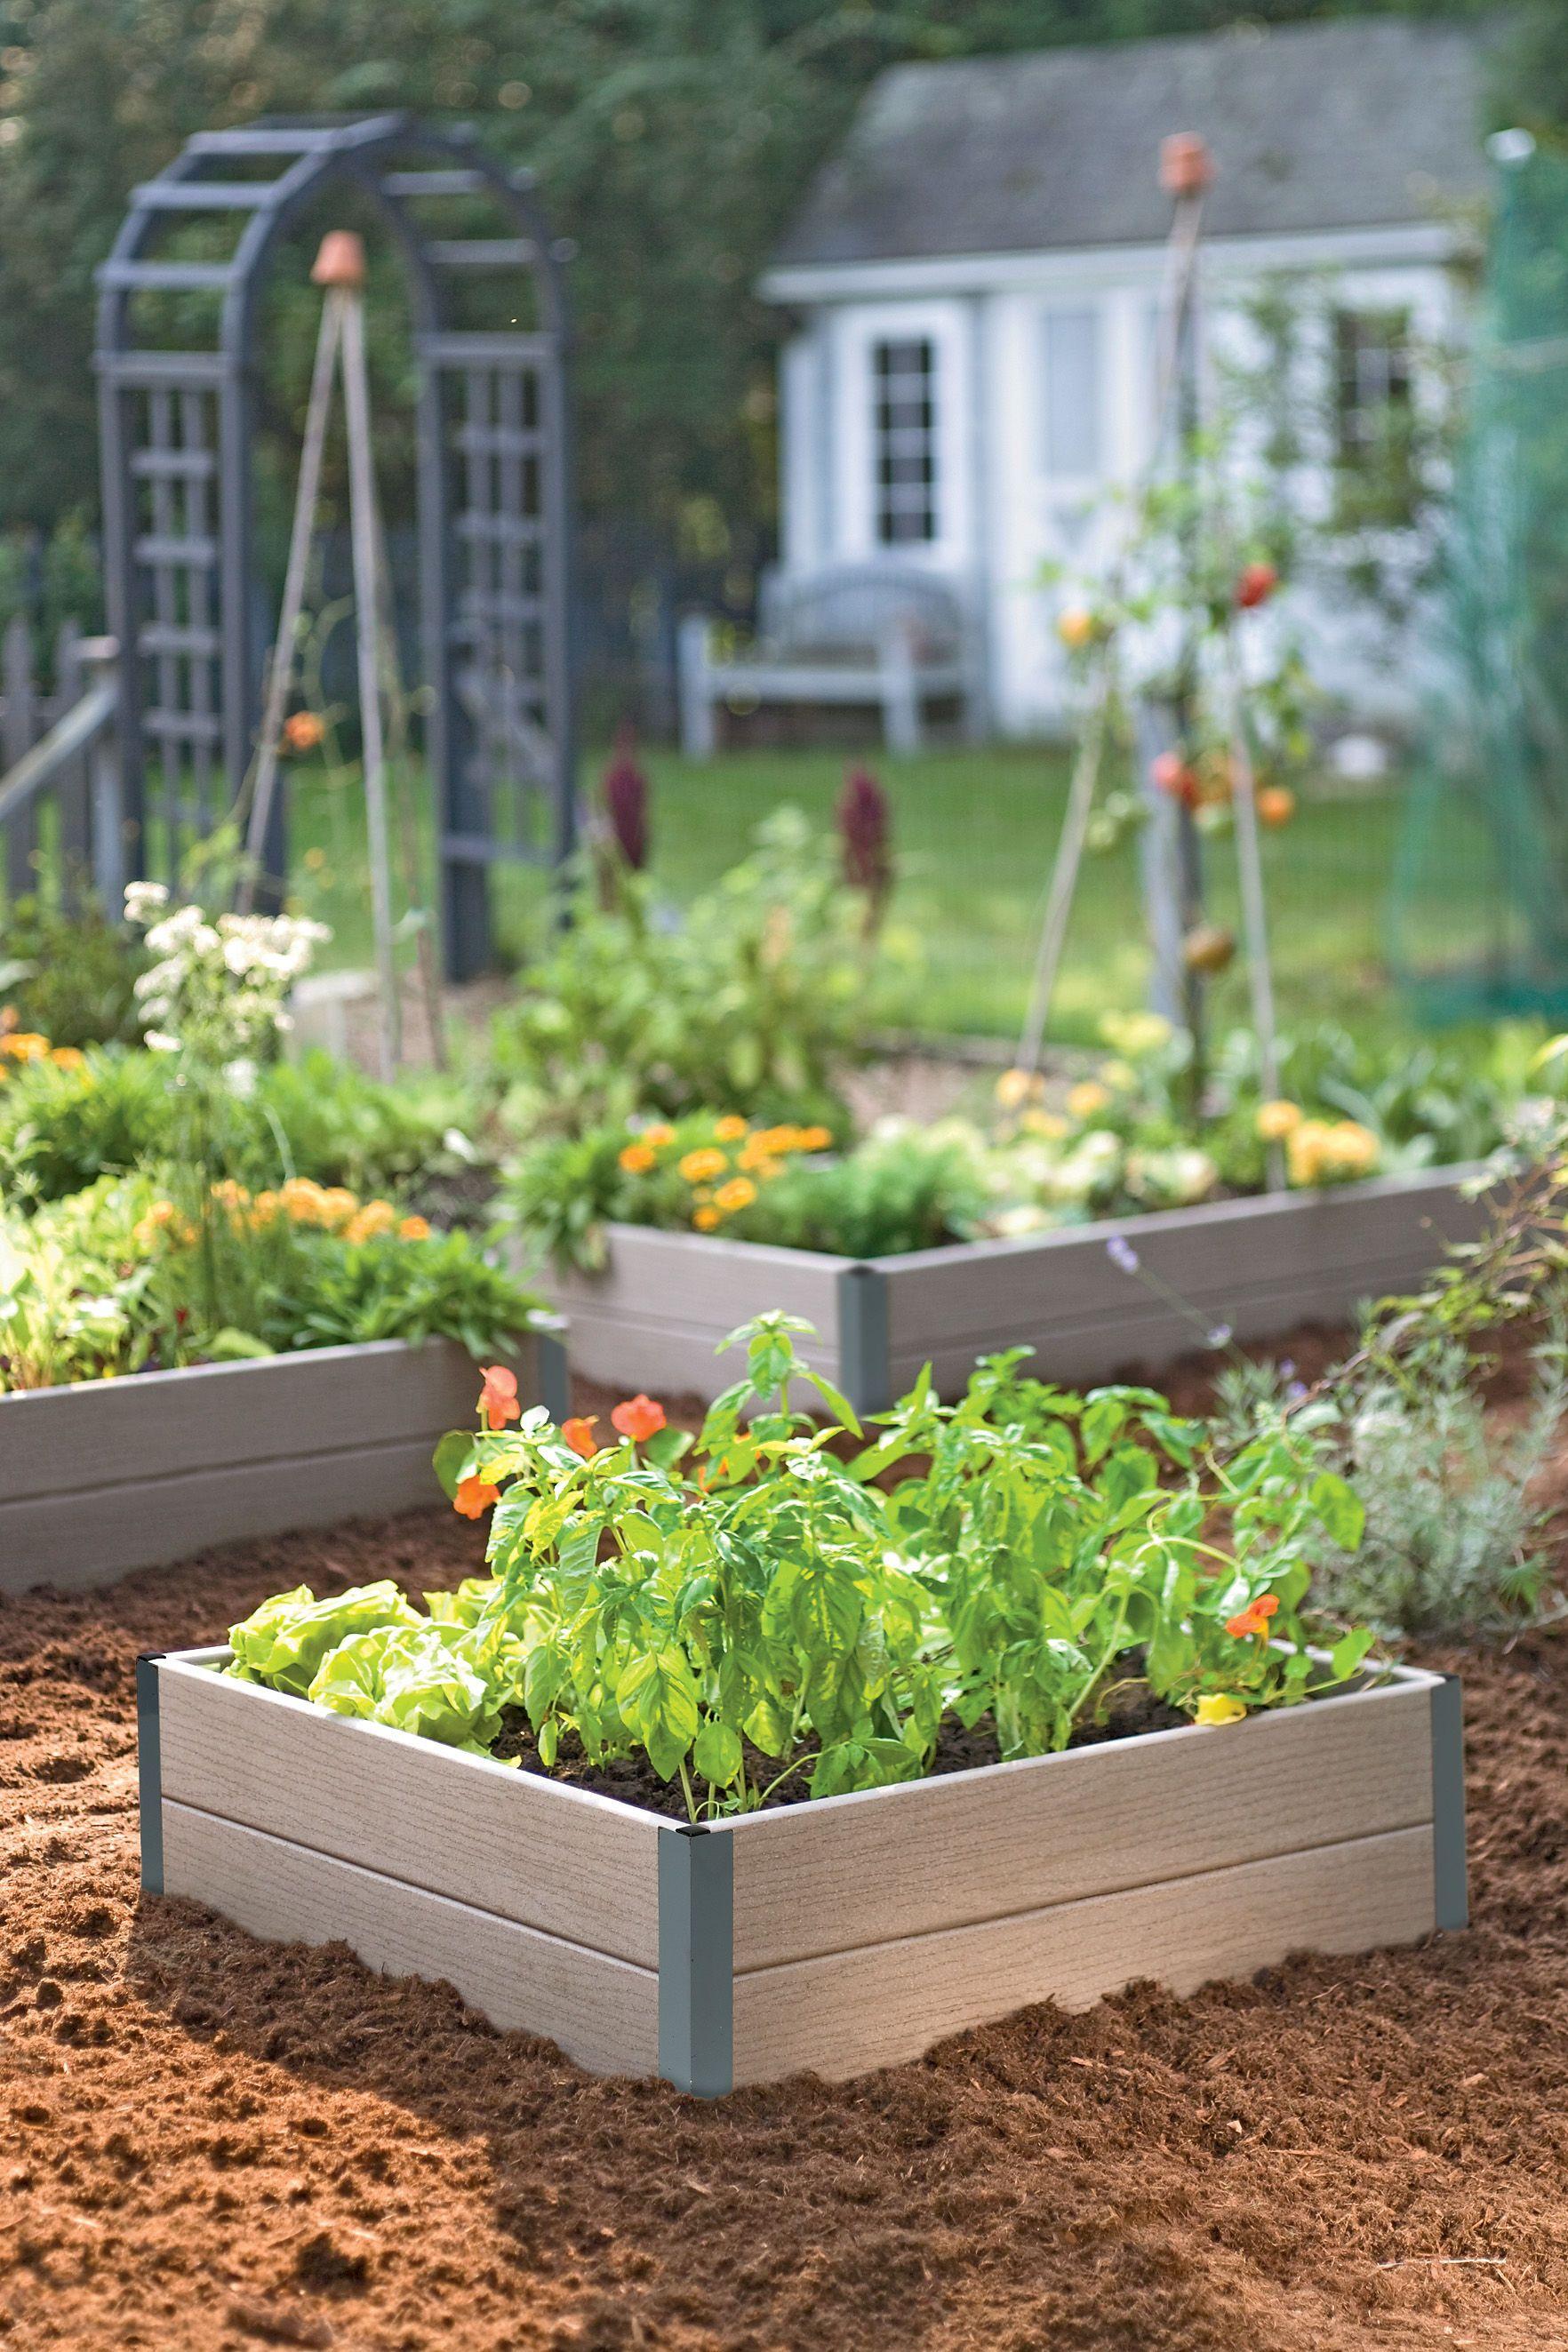 Stackable Corner Joints For Raised Beds Gardeners Com Backyard Vegetable Gardens Vegetable Garden Design Raised Garden